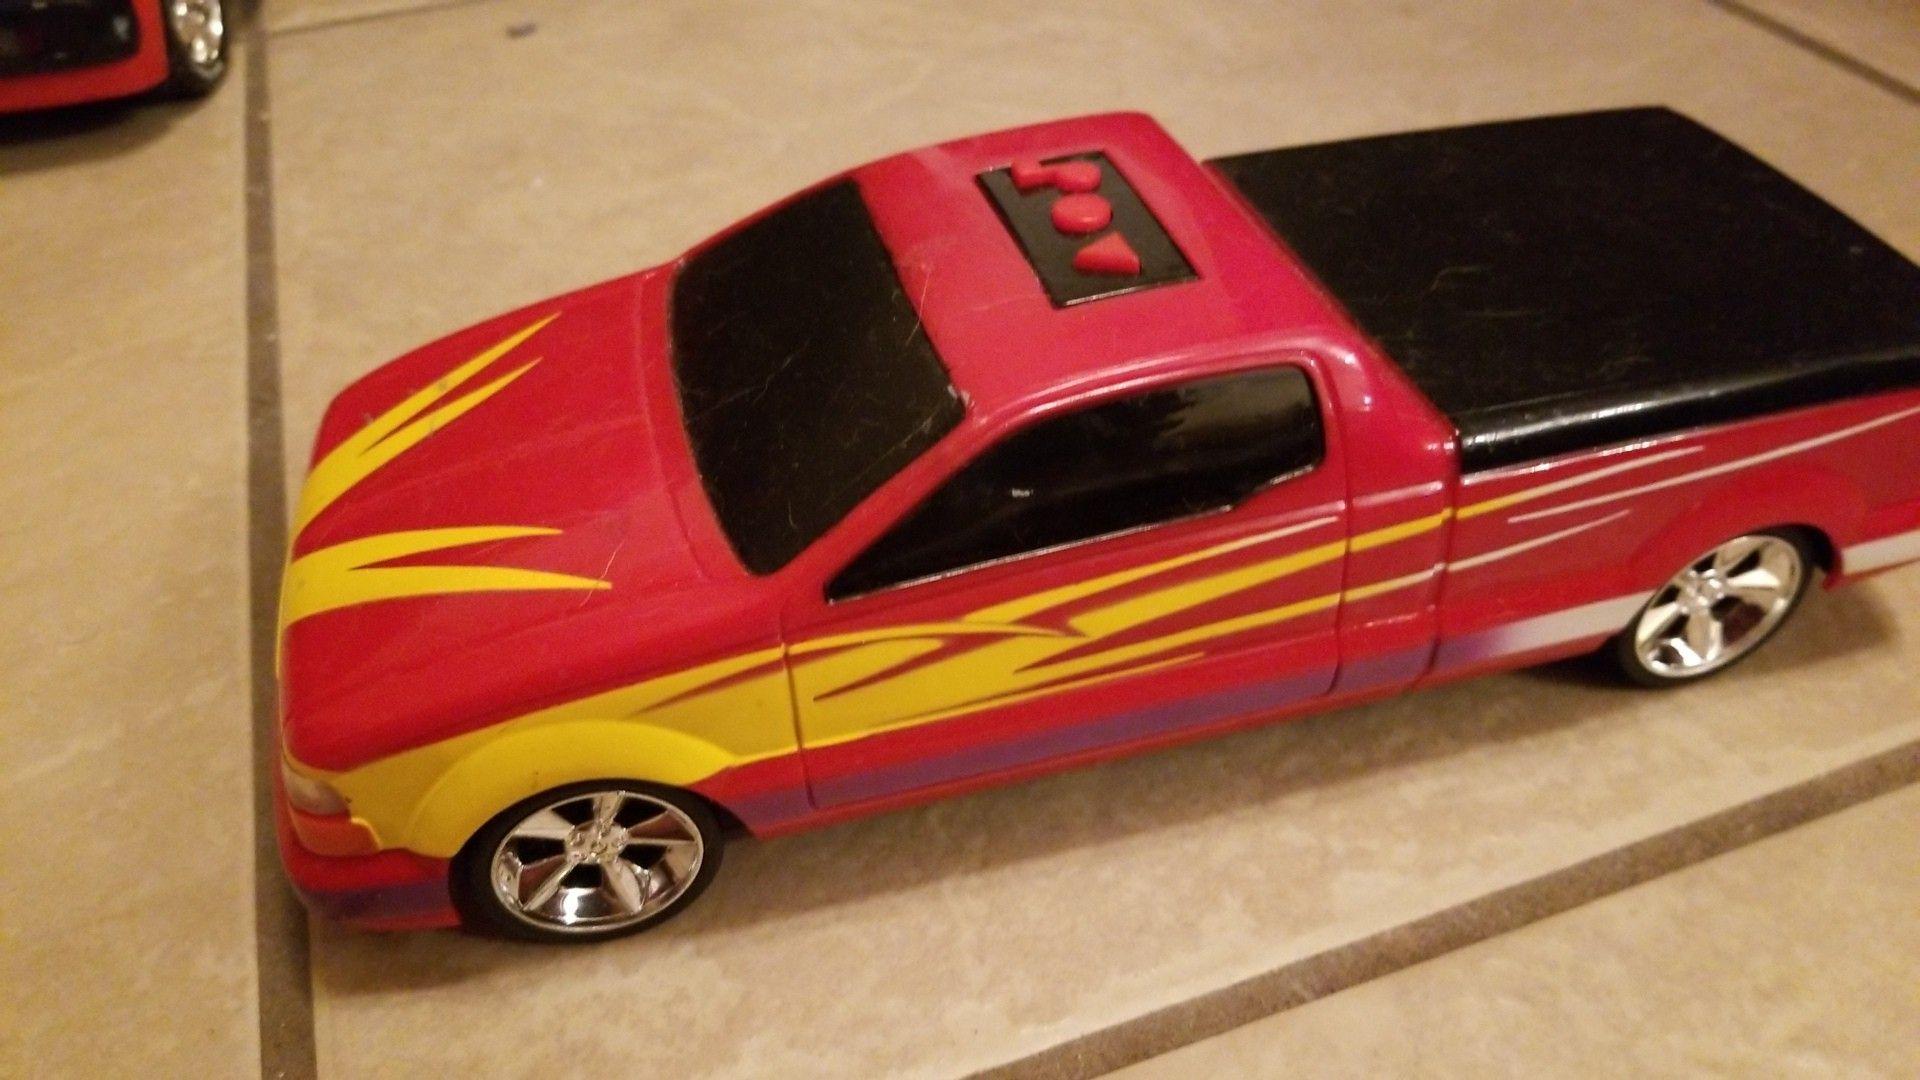 Road Rippers Rockin Rider Lowrider Remake Toy Car Lowriders Rockin